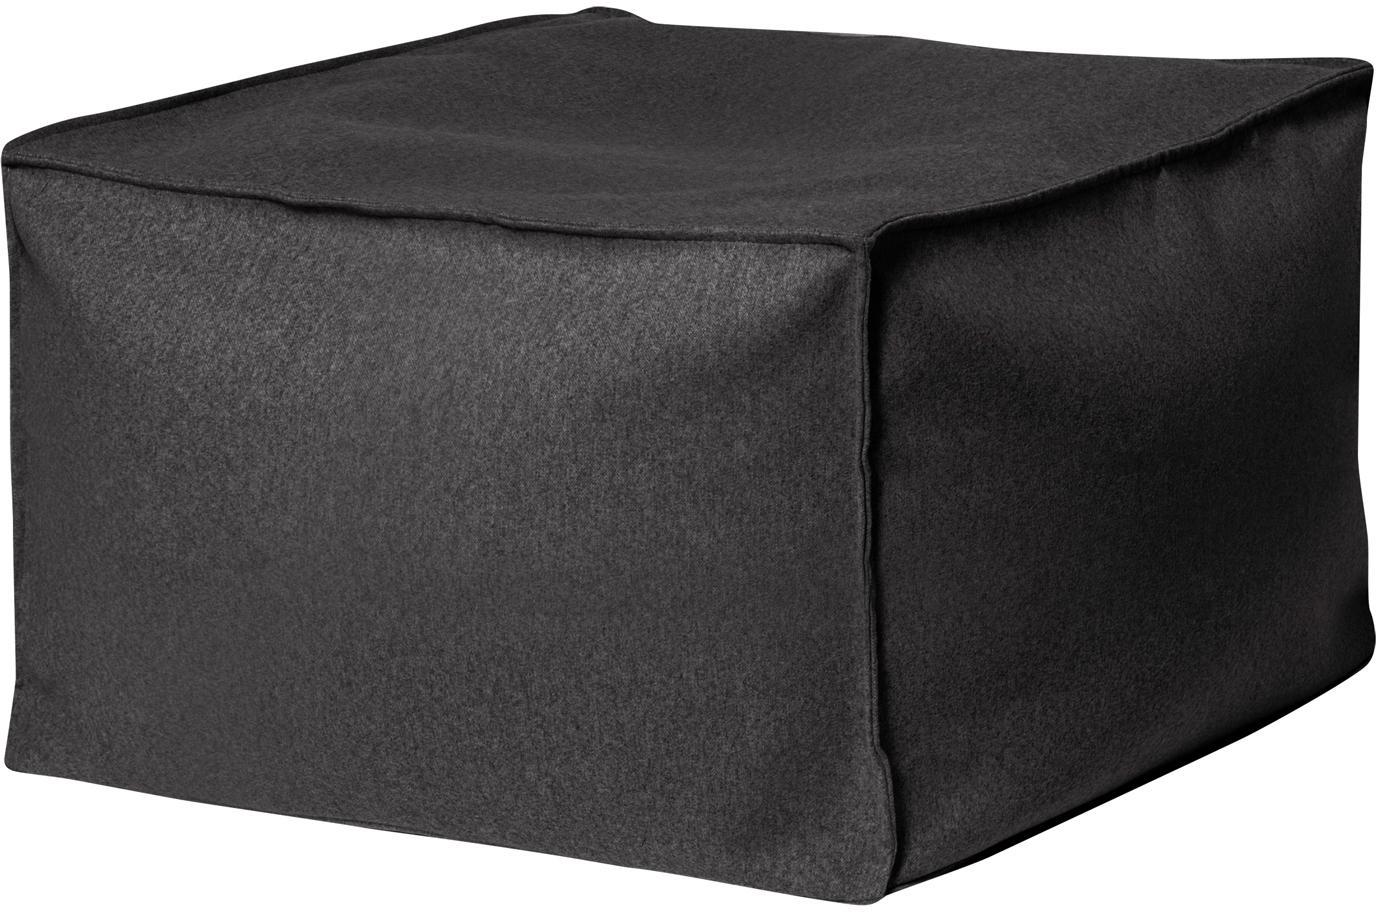 Pouf sacco in feltro Loft Felt, Rivestimento: poliestere, Antracite, Larg. 60 x Alt. 45 cm